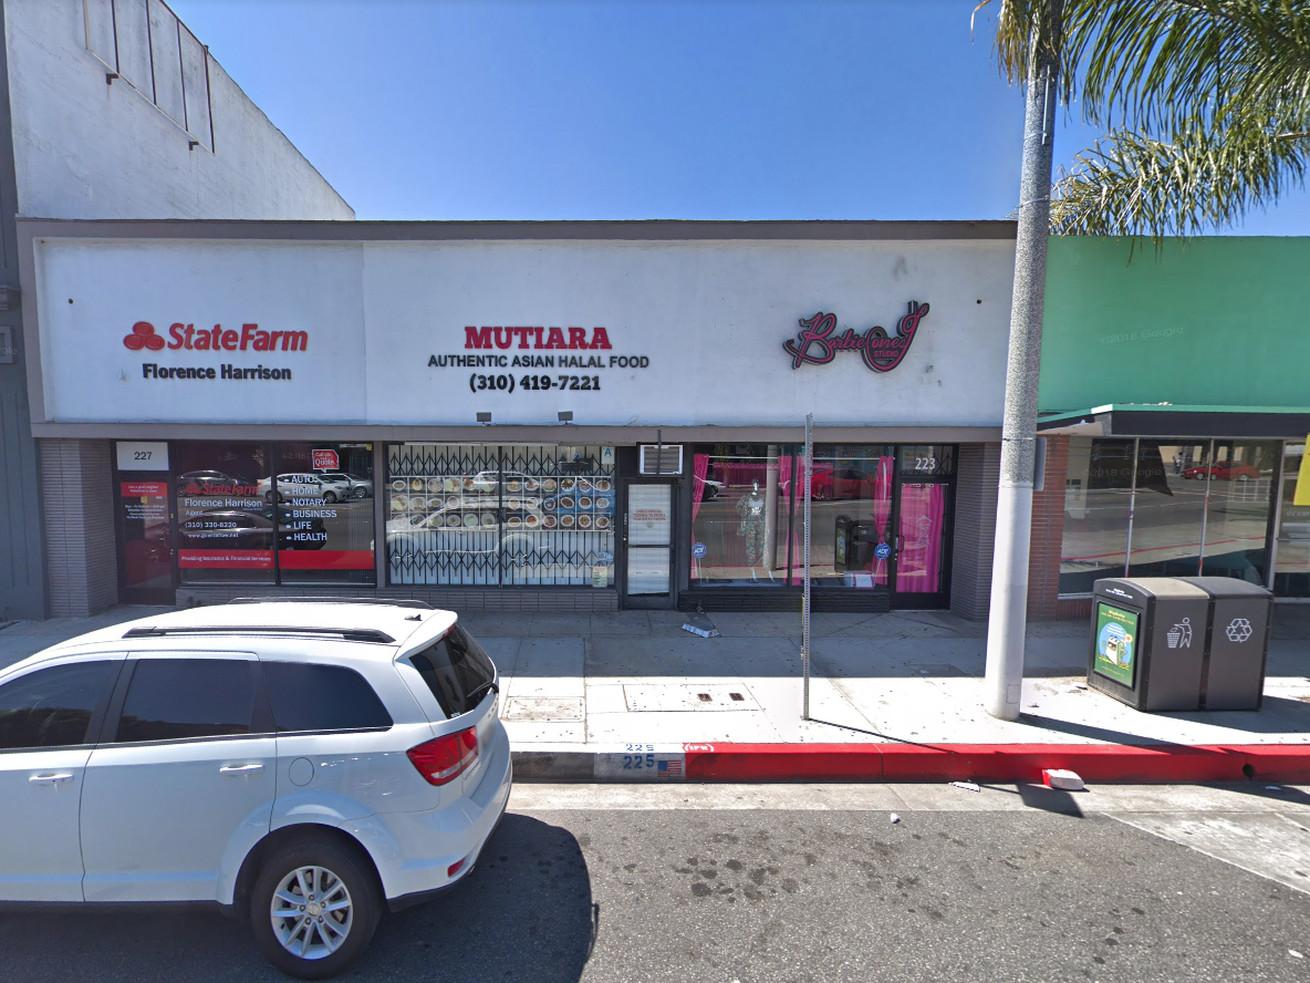 The unassuming storefront for Mutiara